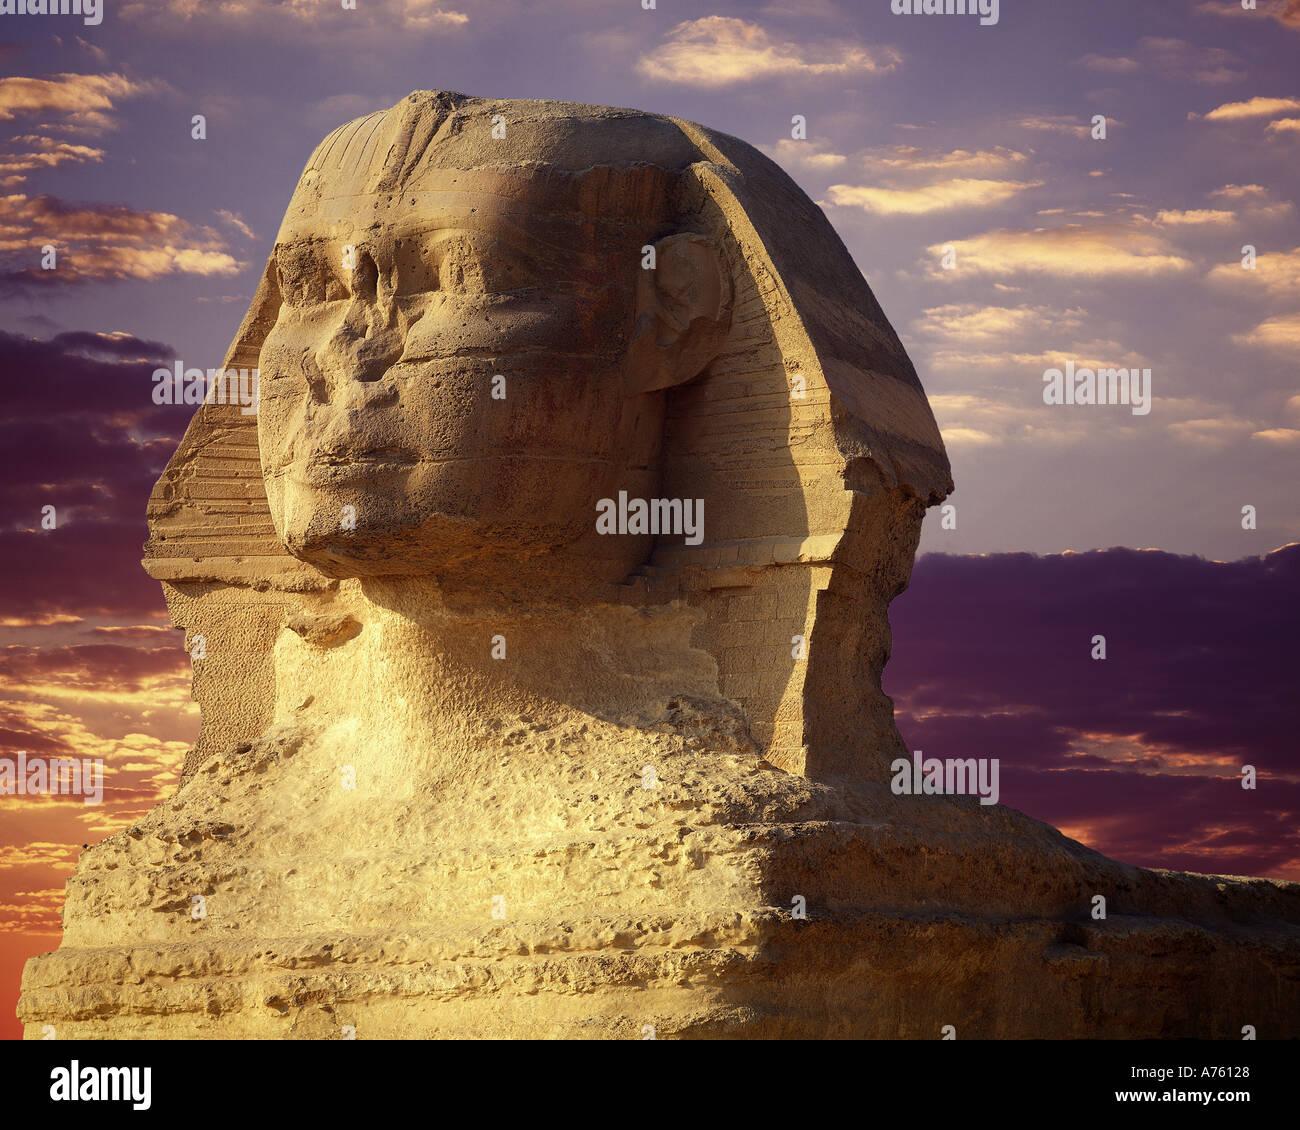 The Sphinx, Giza, Egypt - Stock Image